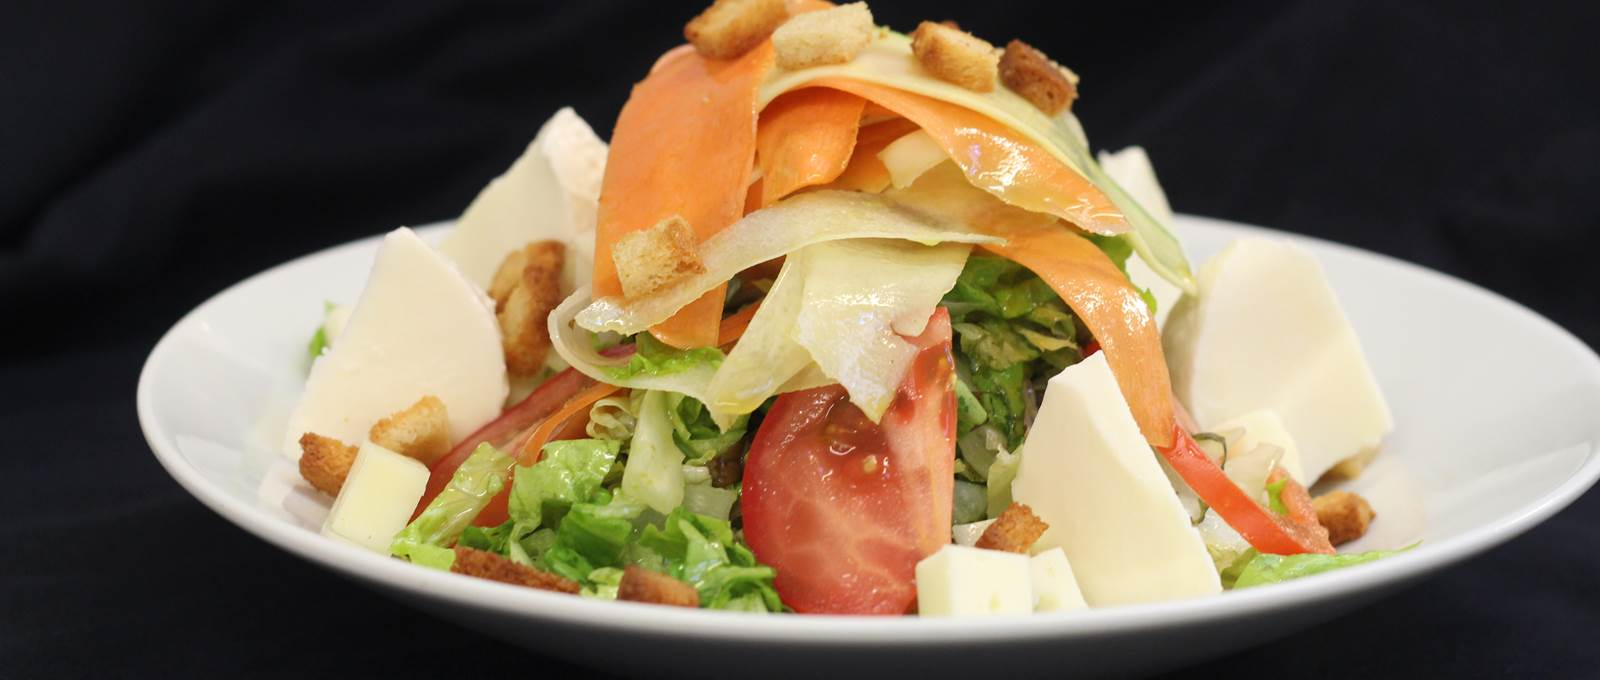 Salade Fraicheur restaurant Le Rond Point d'hOr Hossegor